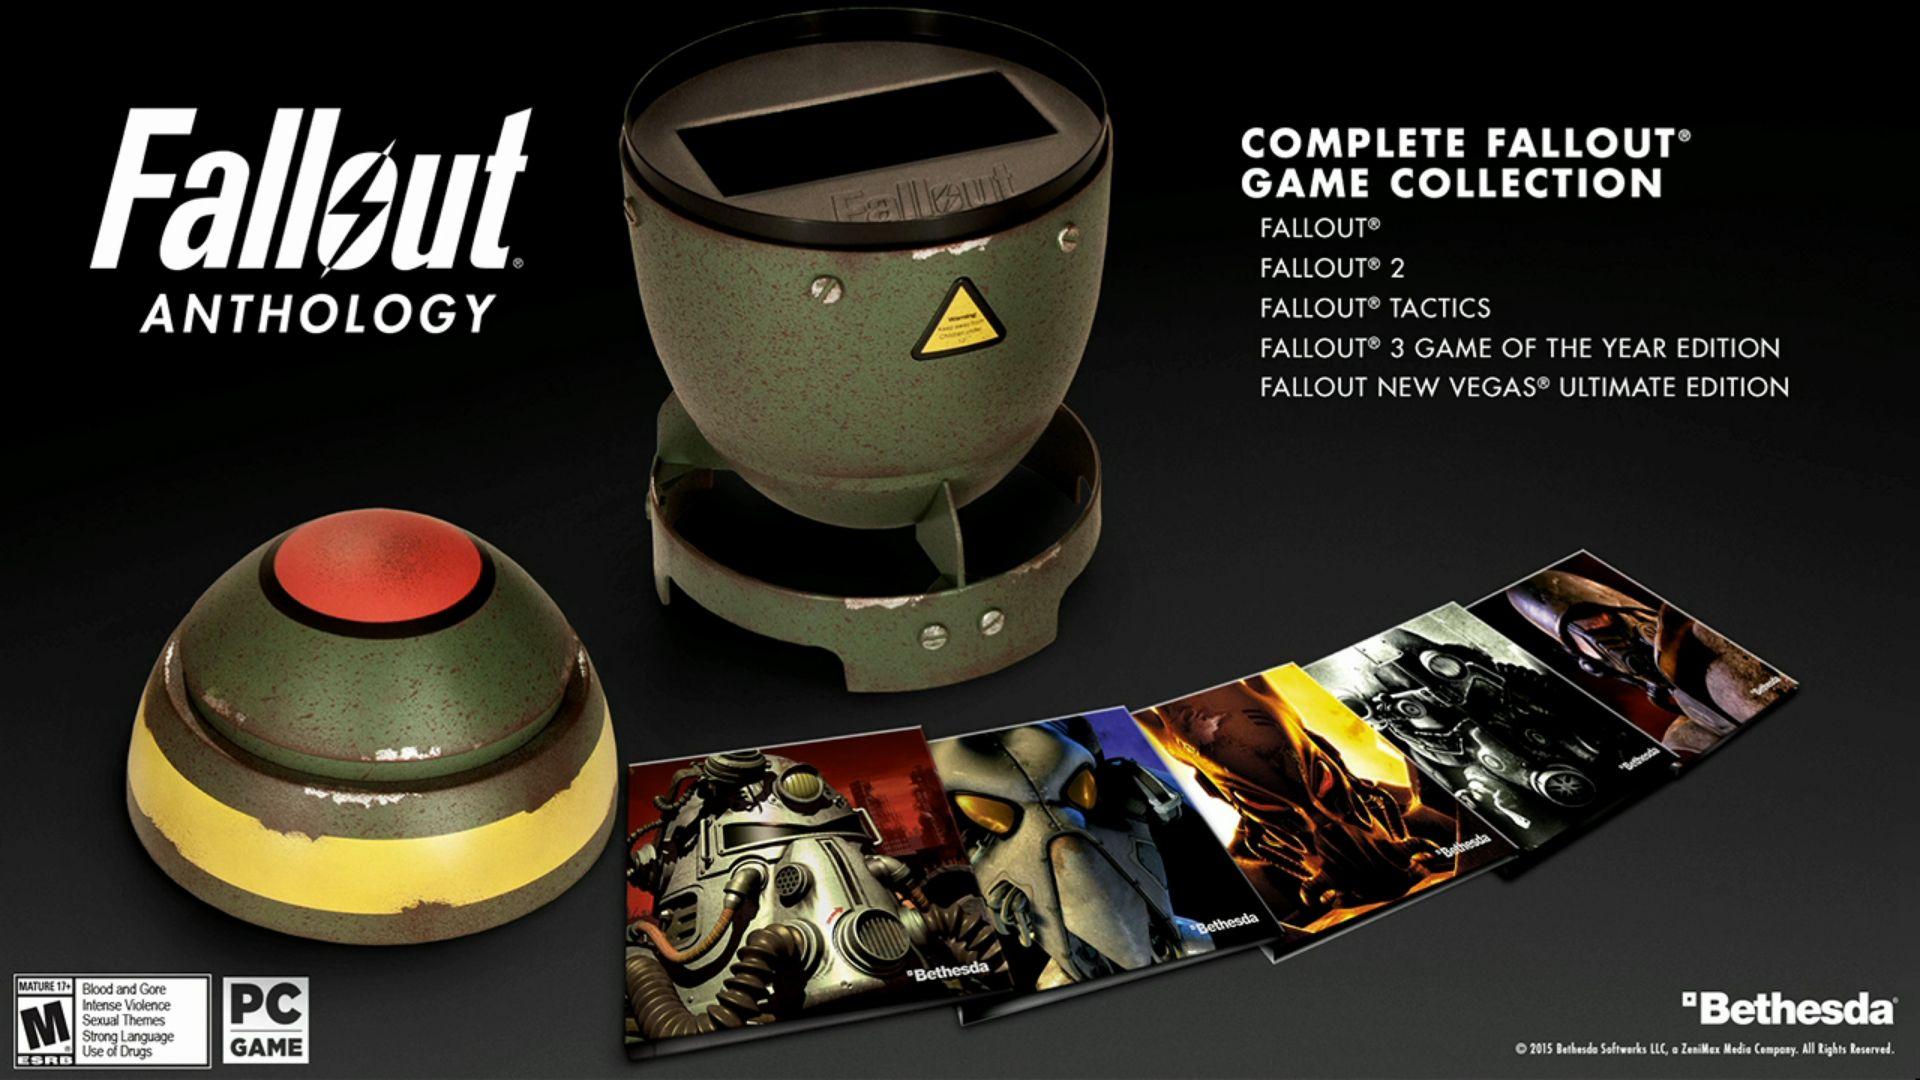 FalloutAnthology-2.jpg